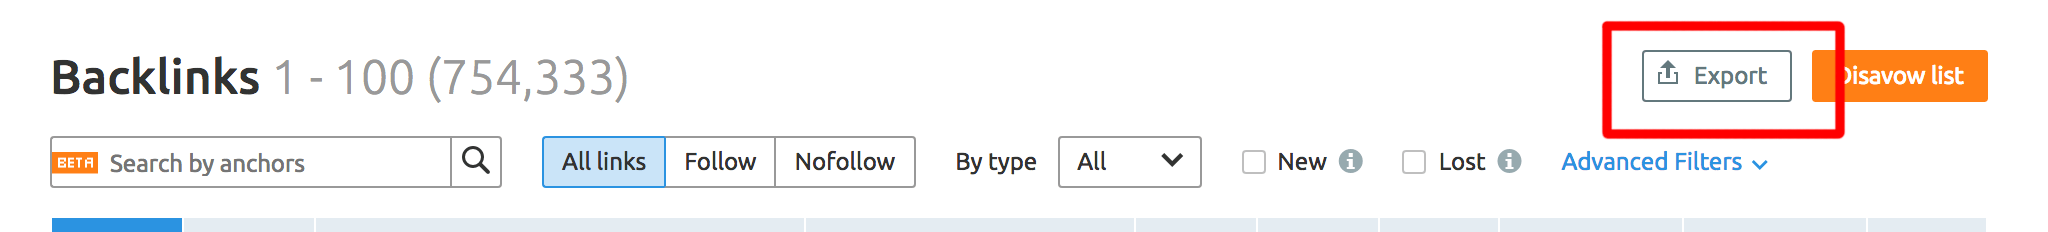 SEMrush backlinks report export option